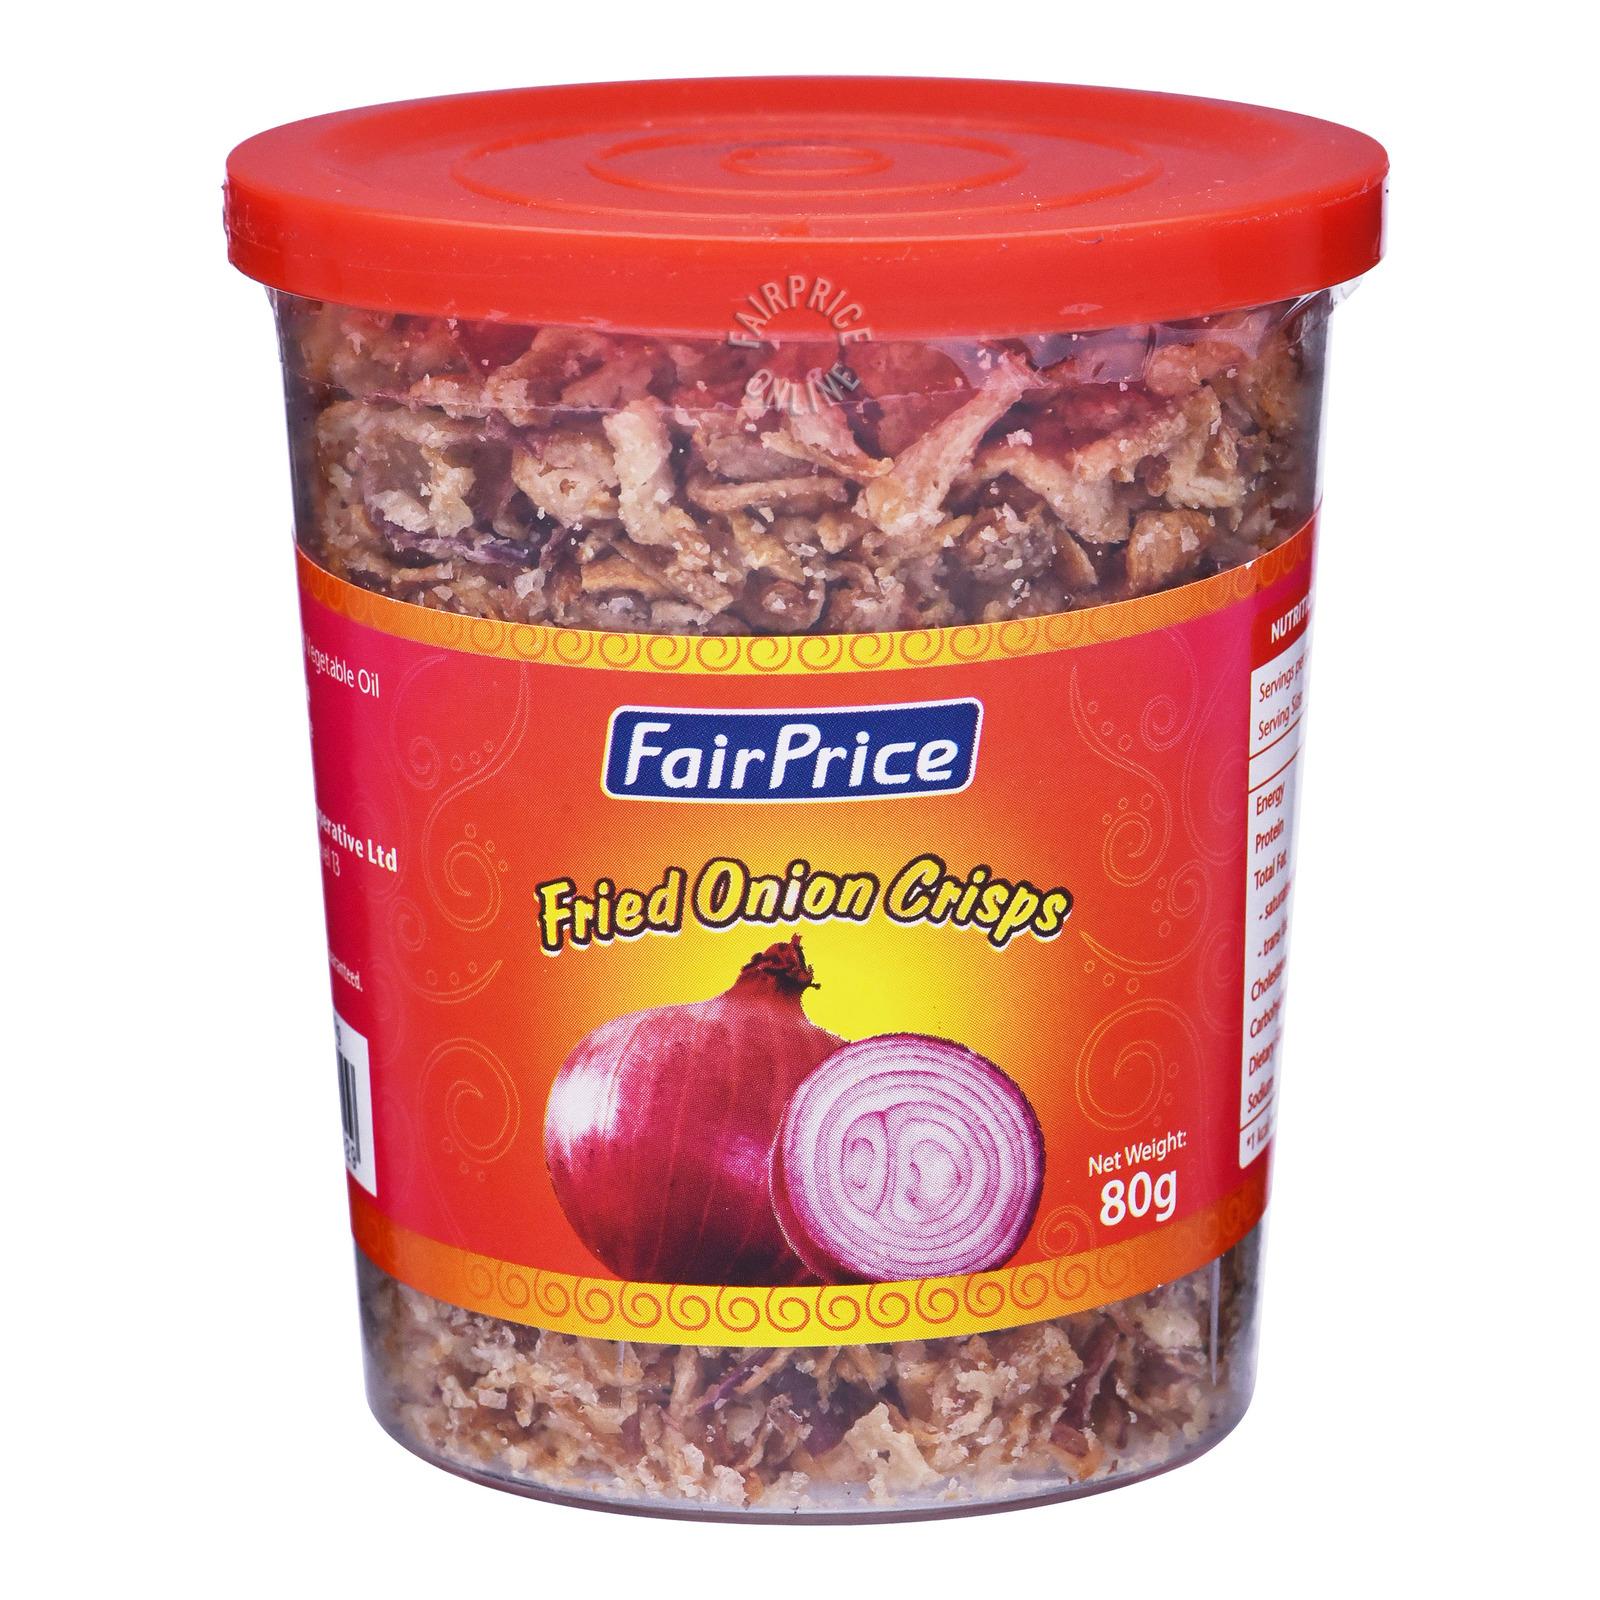 FairPrice Fried Onion Crisp